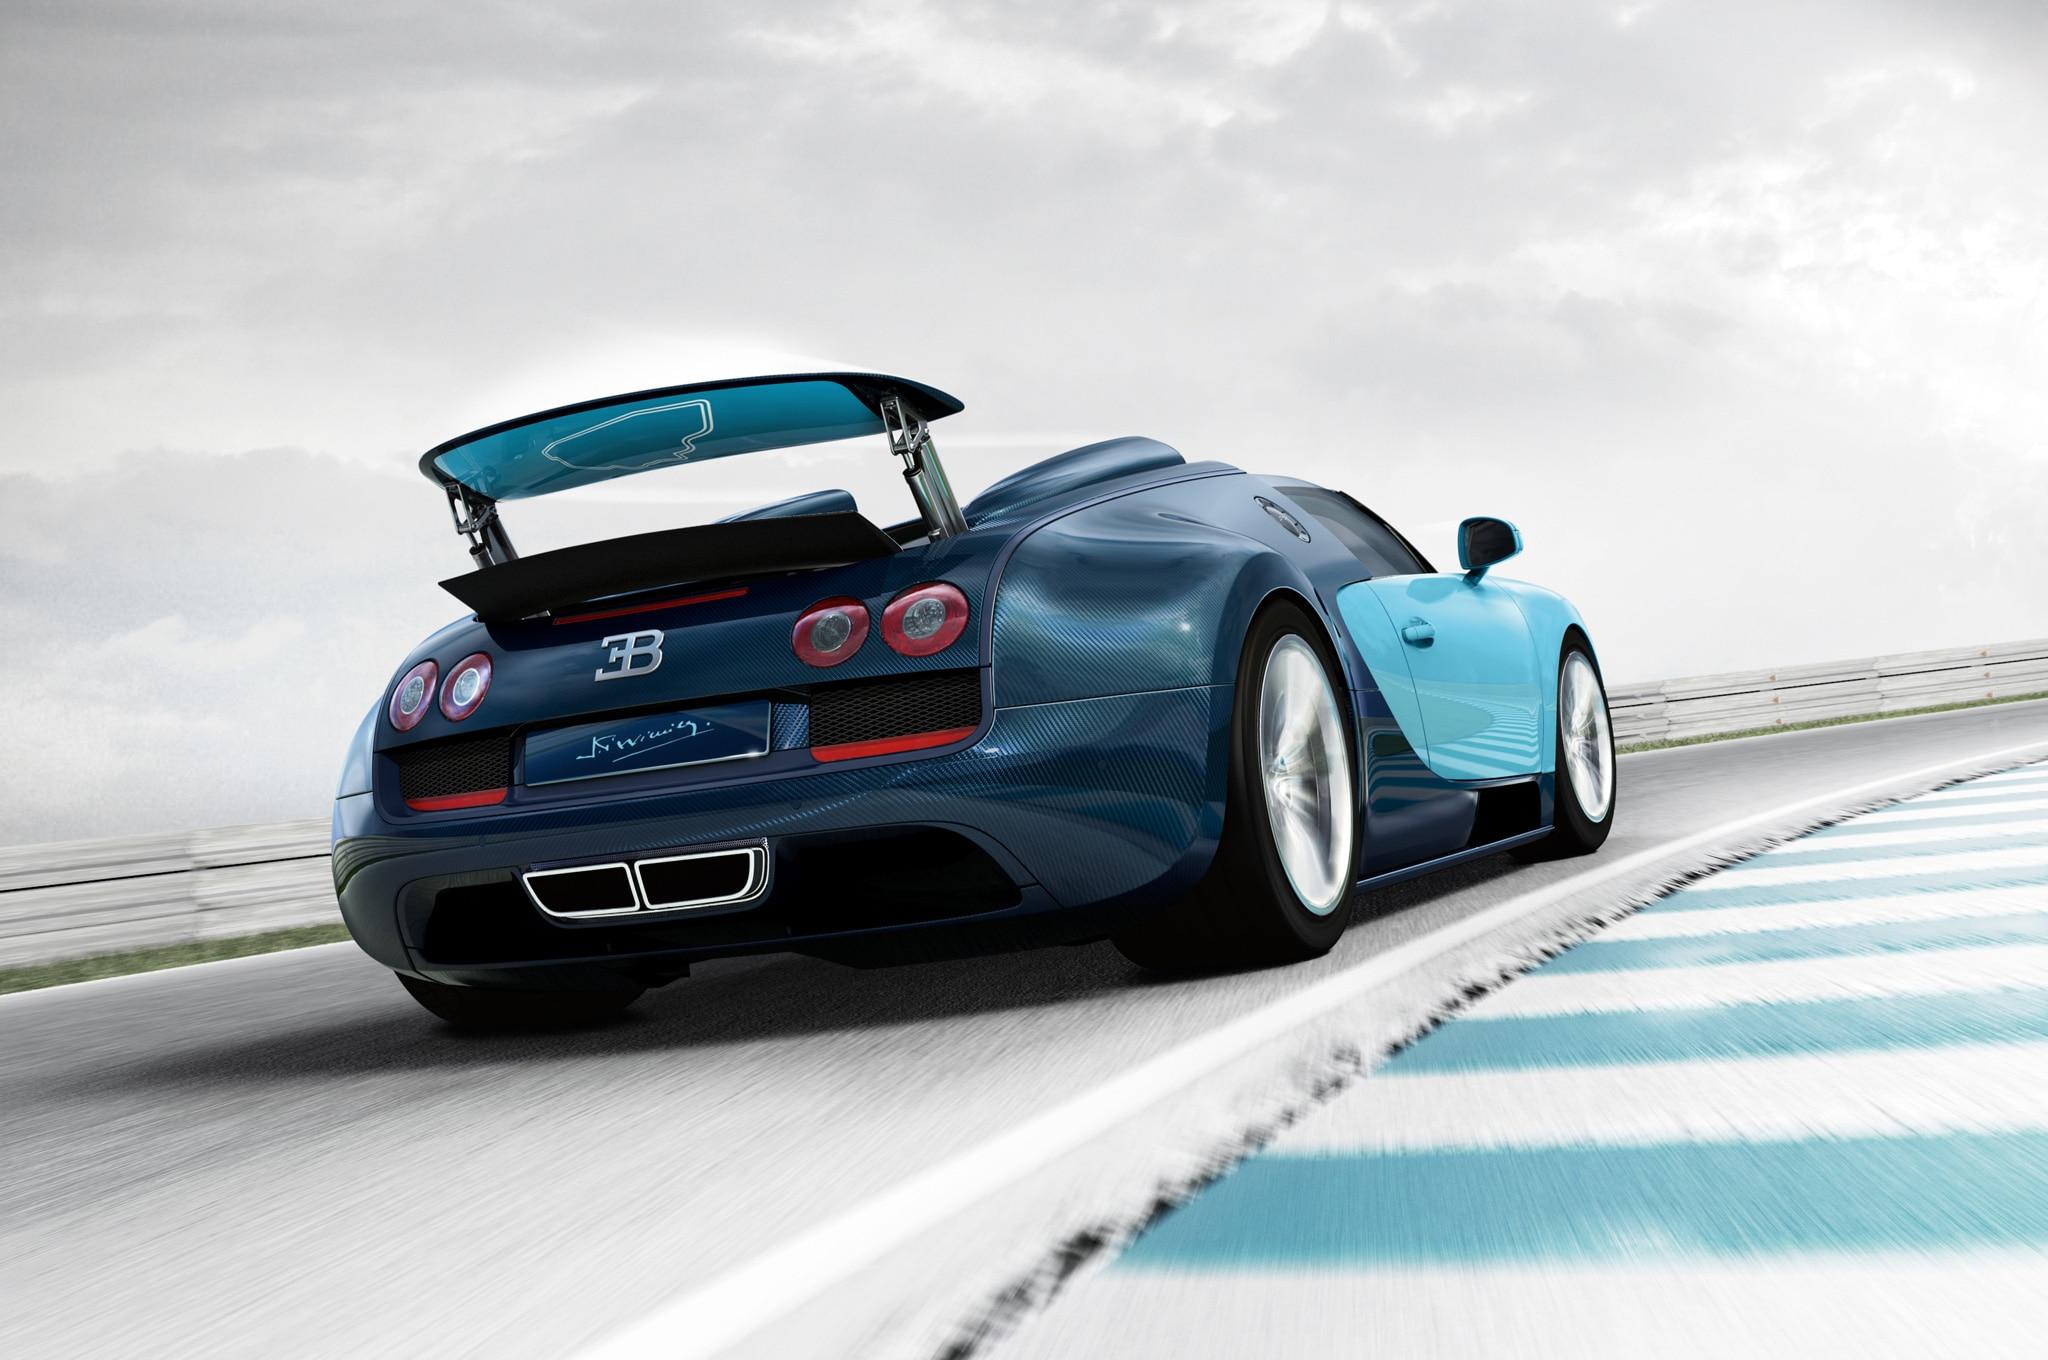 2013 Bugatti Veyron Grand Sport Vitesse Jean Pierre Wimille Edition Rear View1